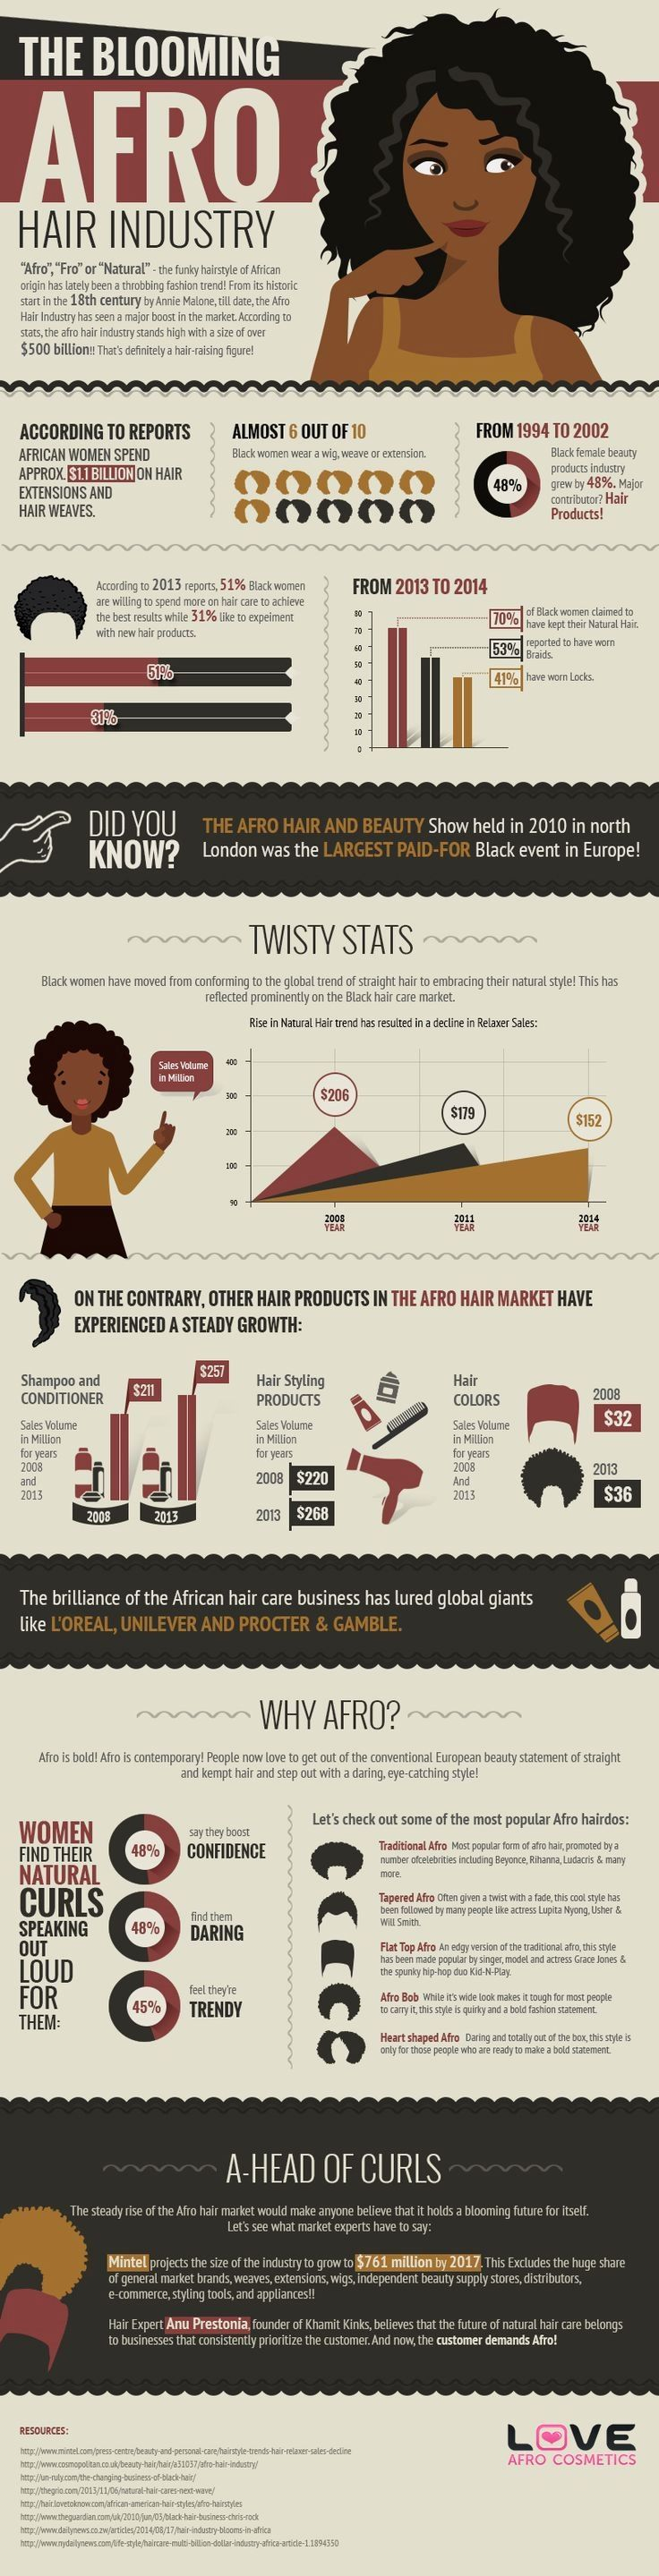 best Natural Hair Gorgeous Hair images on Pinterest Black